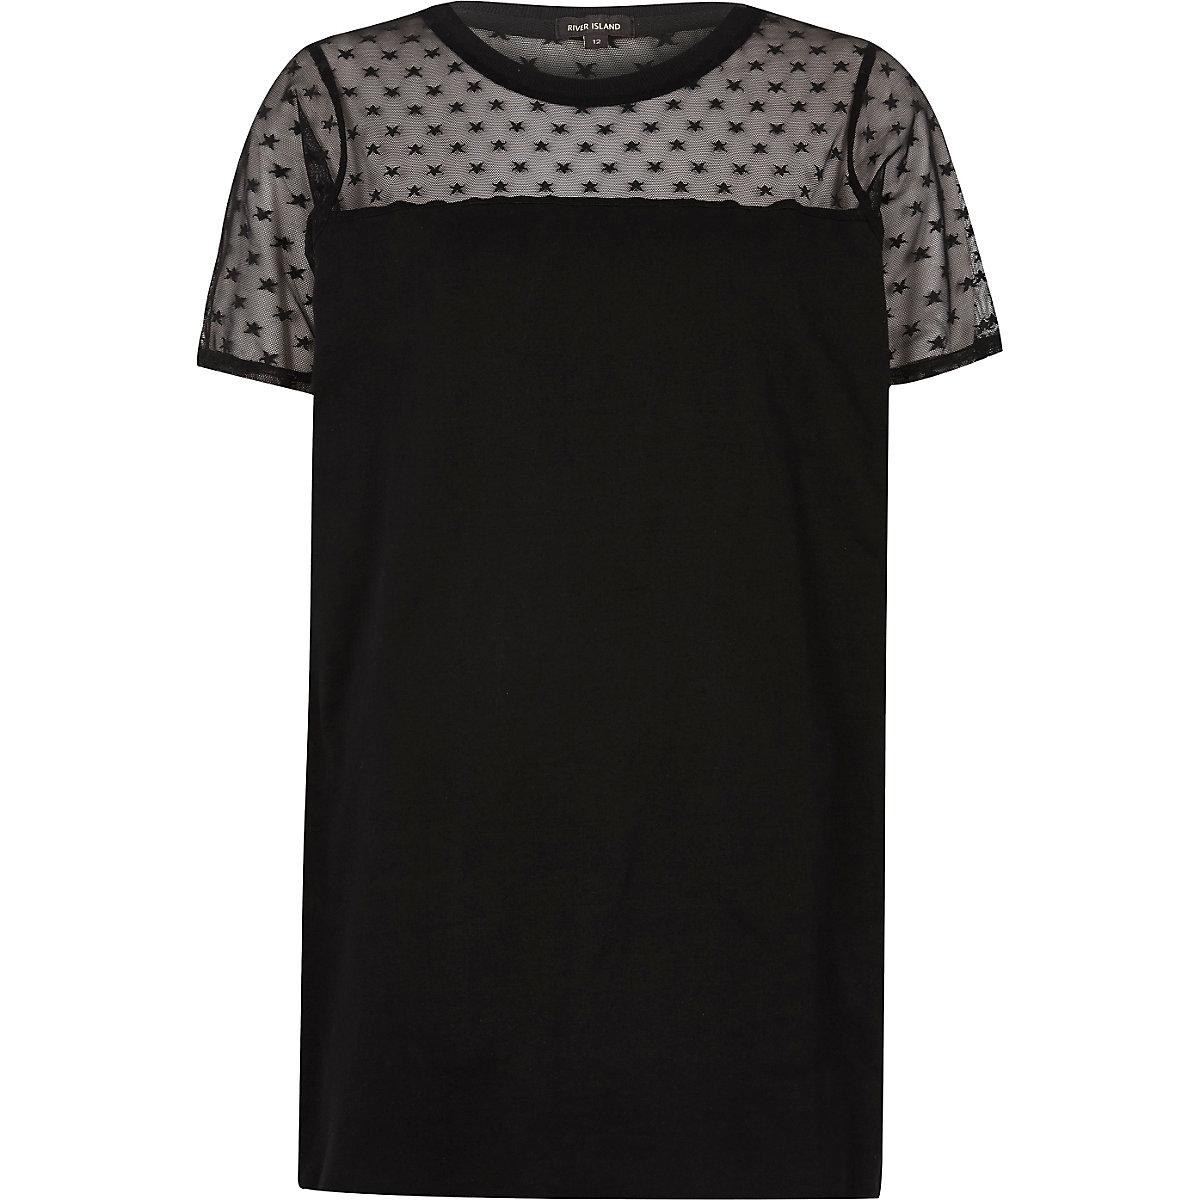 3584e401cec Black star mesh oversized T-shirt - RI Limited Edition - women